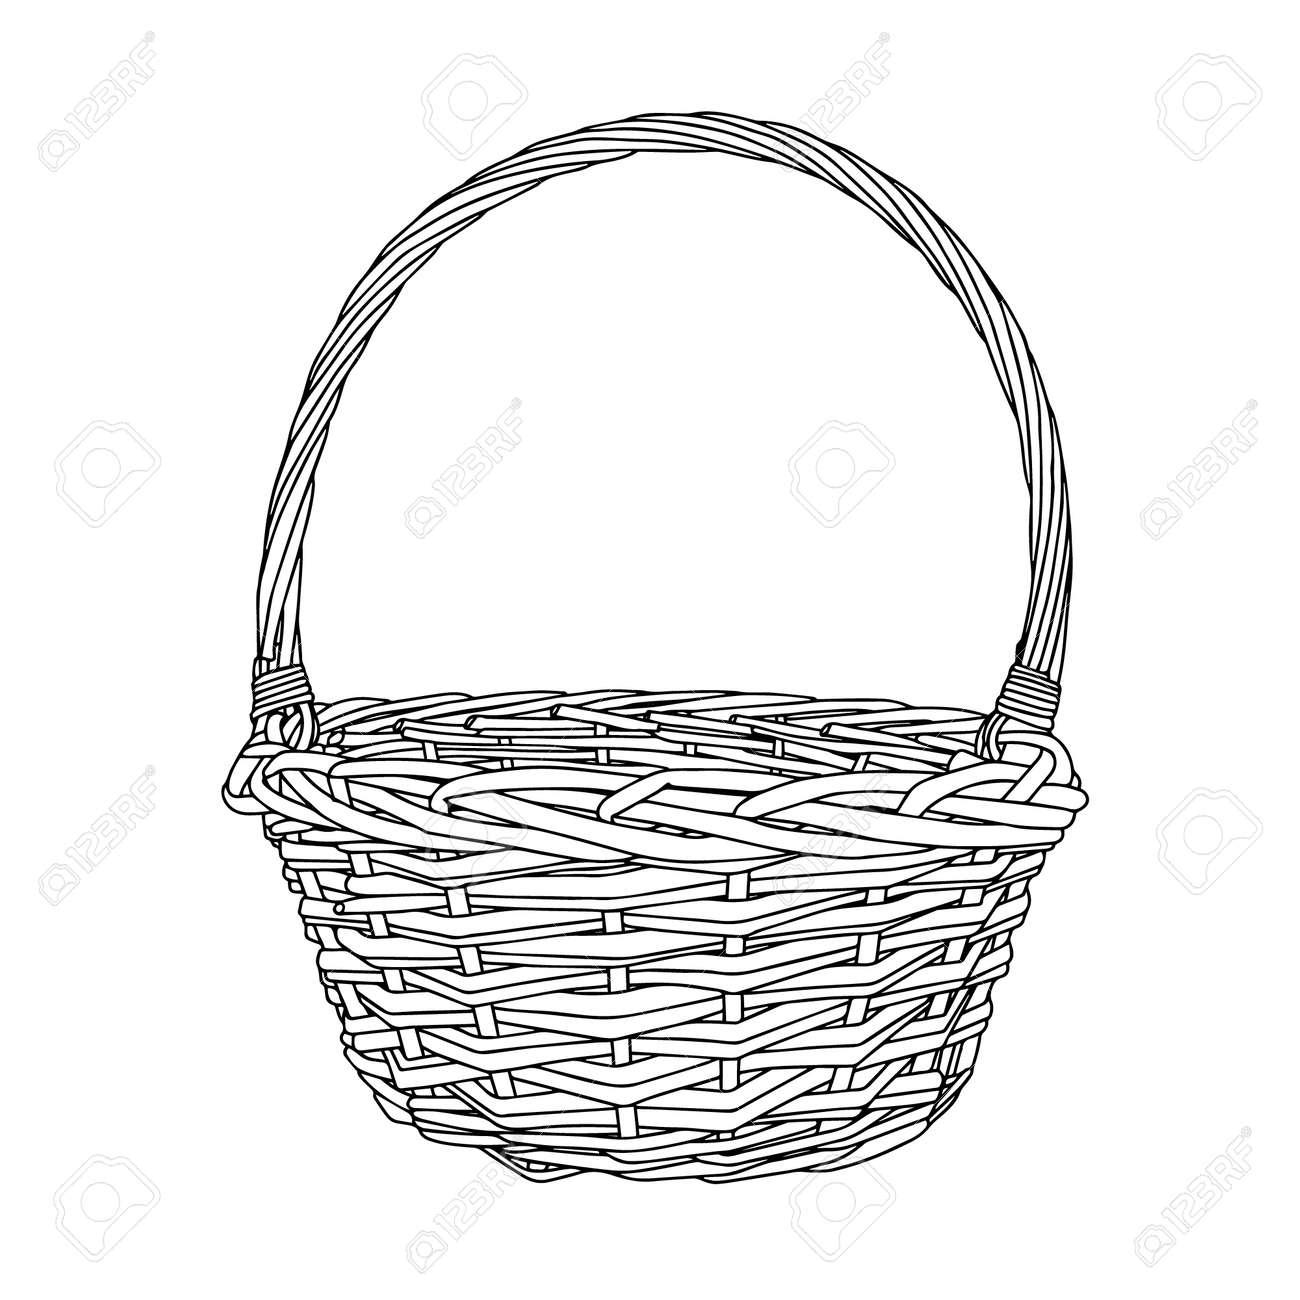 Picnic Basket Clipart family picnic food #familypicnicfoods Picnic Basket  Clipart family picnic food   Family picnic food, Family picnic, Picnic food